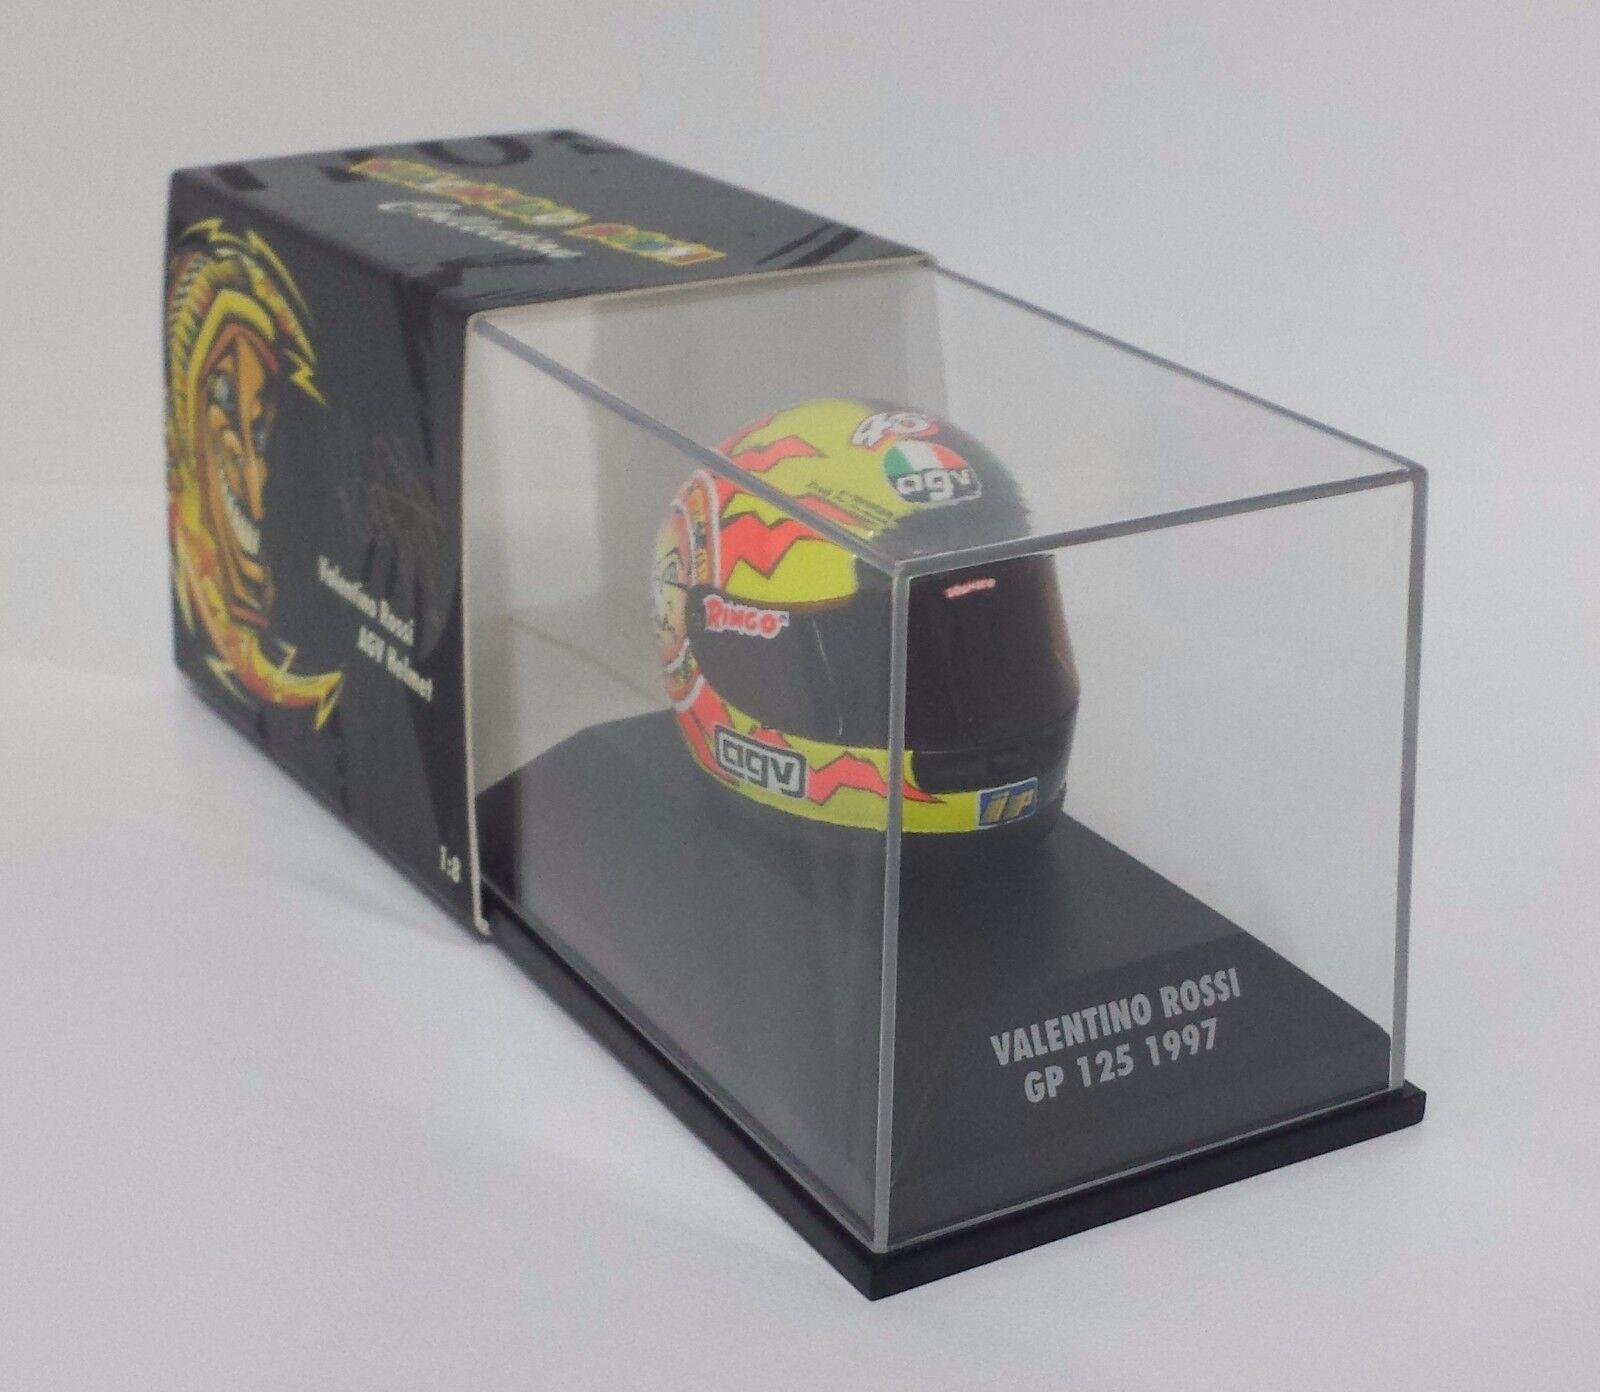 todos los bienes son especiales Minichamps Valentino Rossi AGV AGV AGV Casco Helmet 1 8 World Champion Gp 125 1997 Raro  Esperando por ti